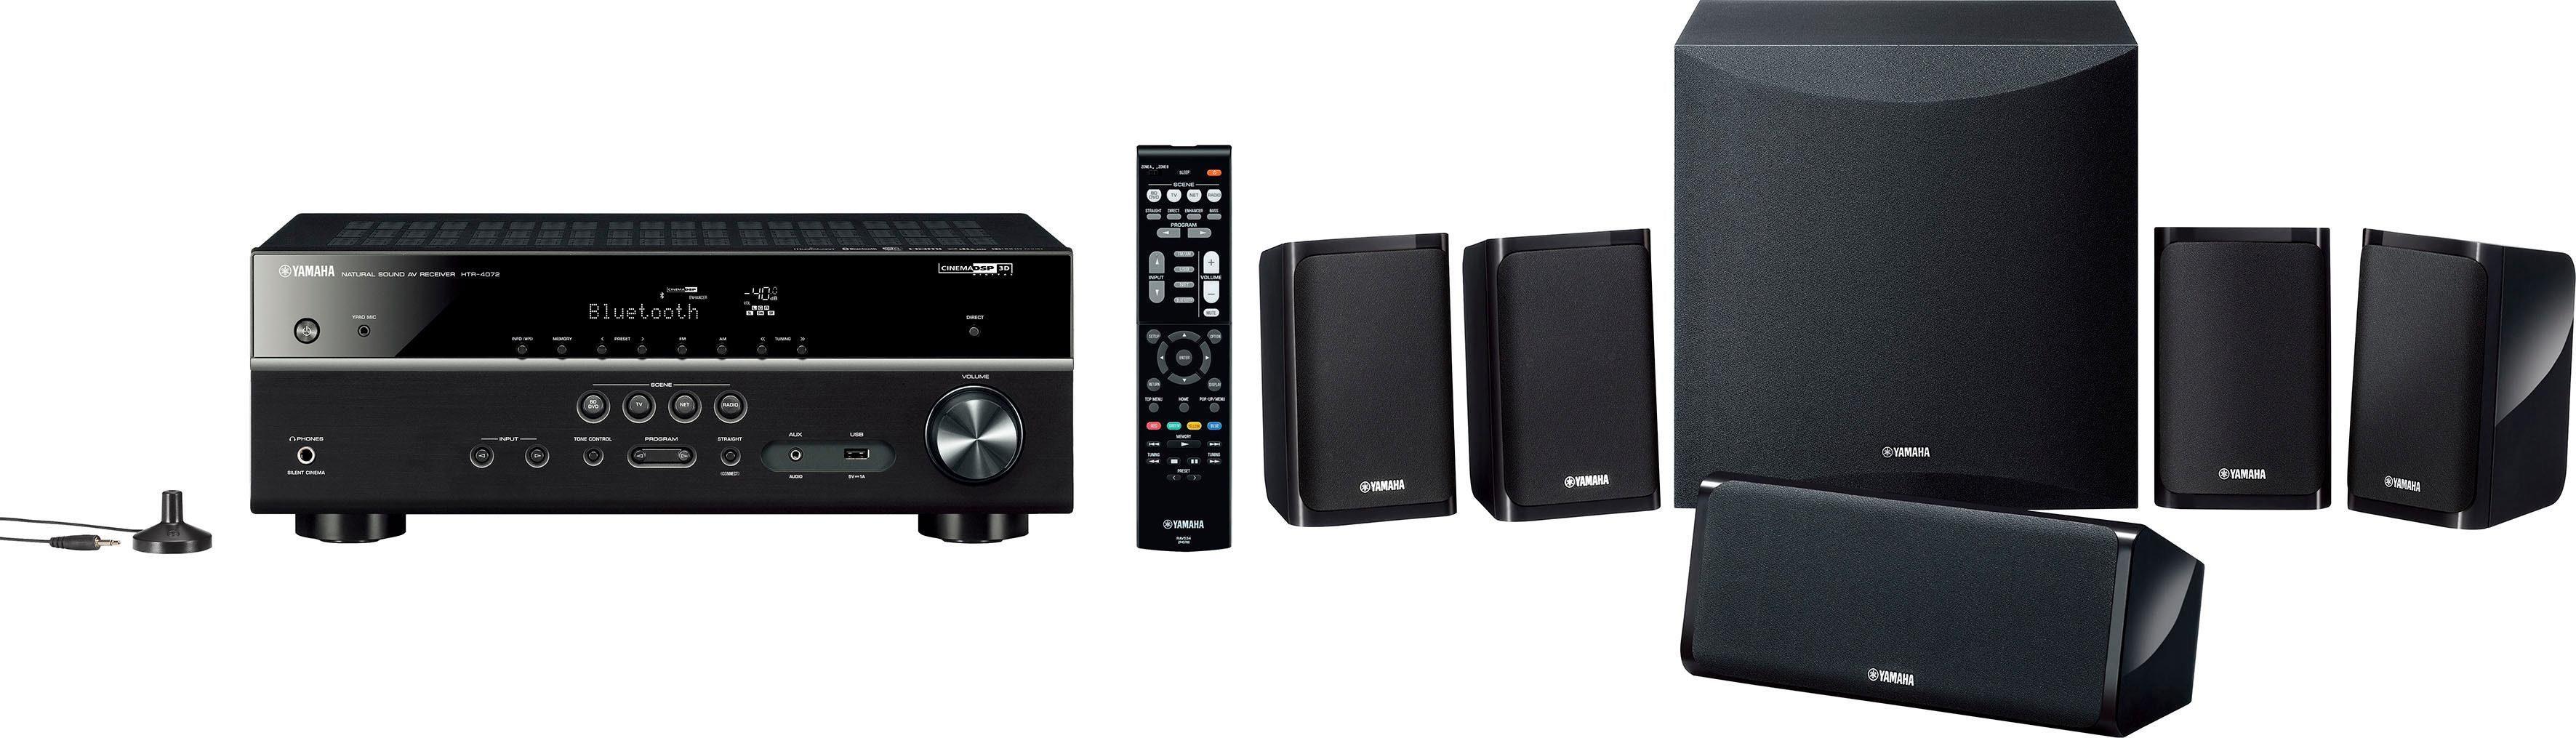 Yamaha YHT-2950 EU 5.1 Heimkinosystem (200 W, Bluetooth, 4K Upscaling, 3D-fähig)